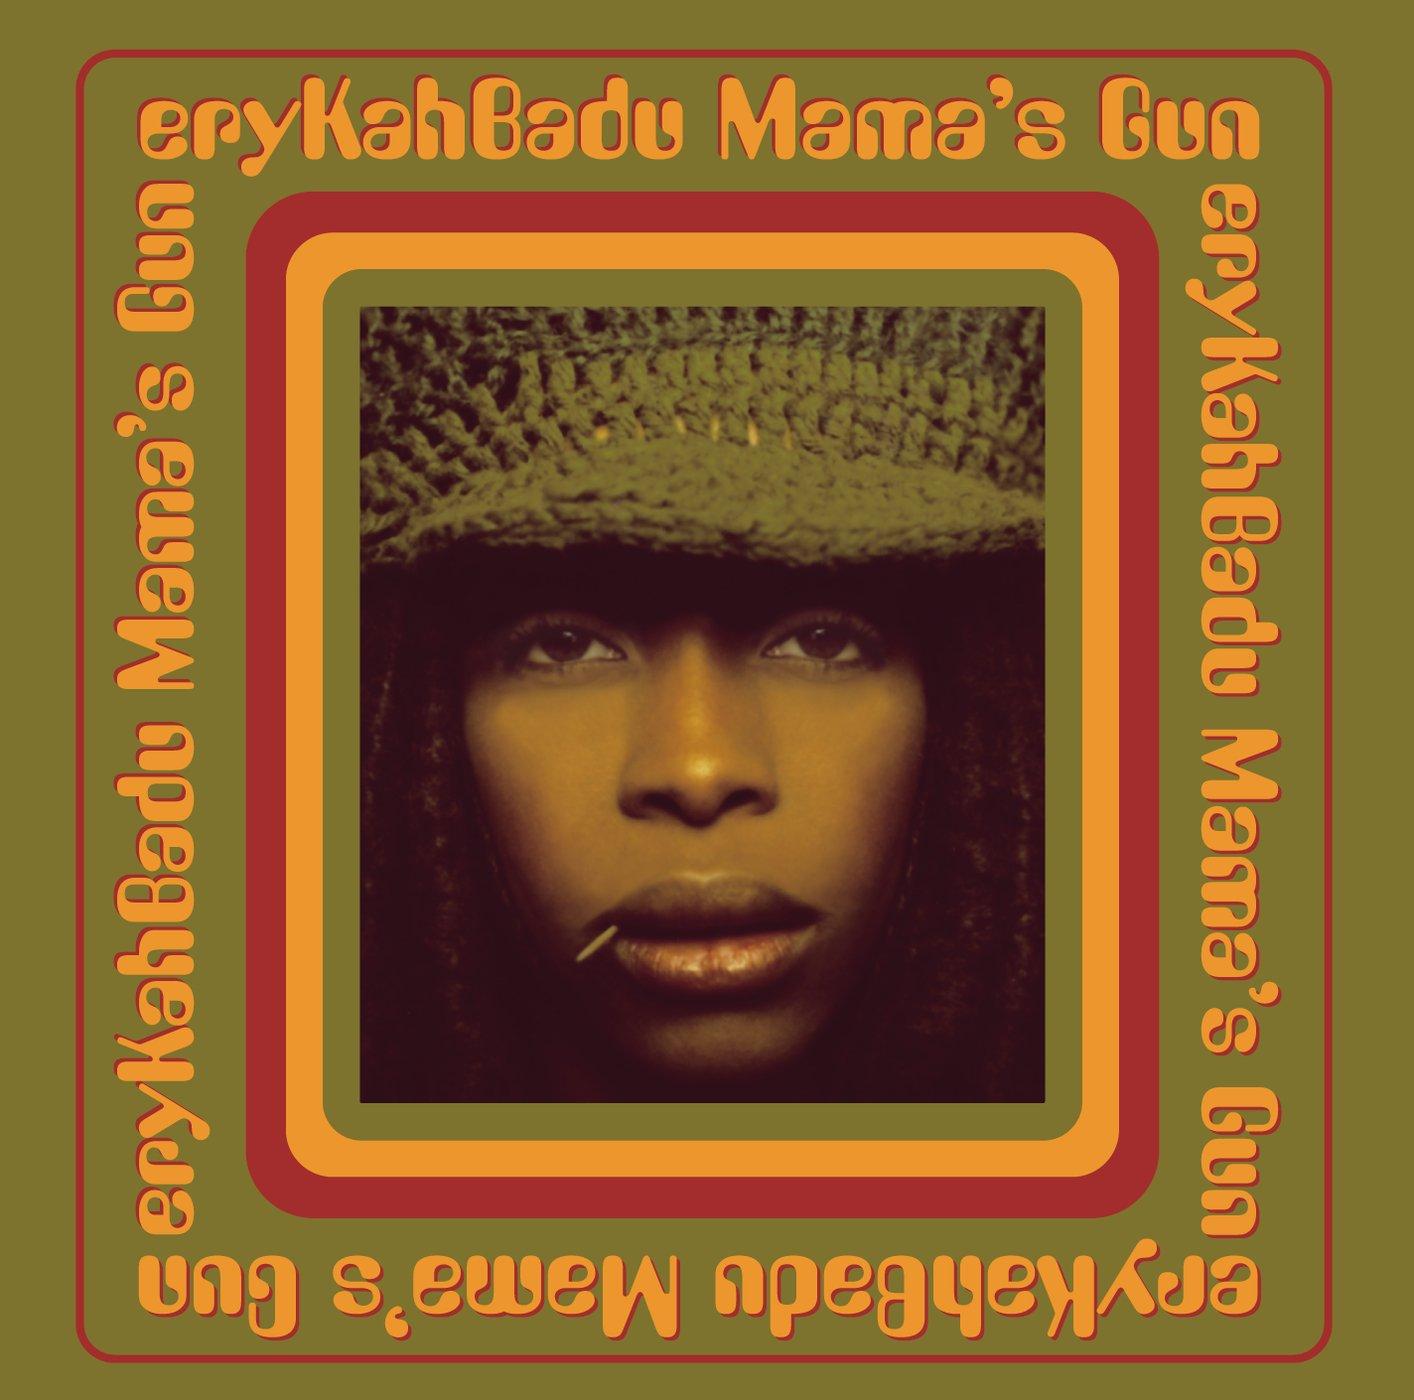 Image result for erykah badu mama's gun vinyl art